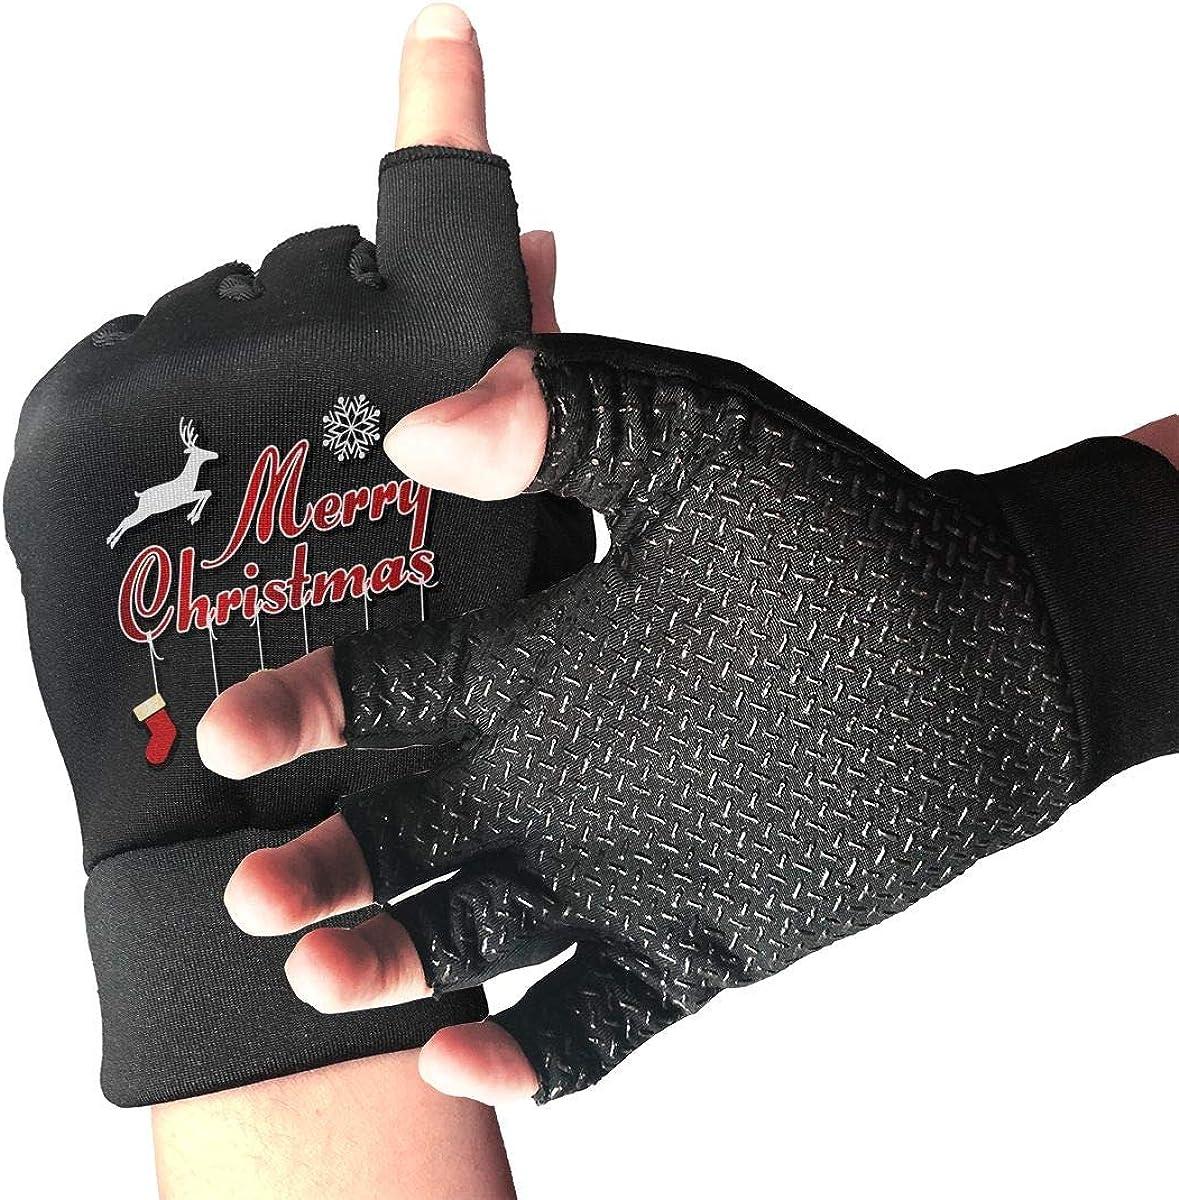 Gloves MERRY CHRISTMAS Shoe Elk Fingerless Gloves Short Touchscreen Gloves Winter Motorcycle Biker Mitten